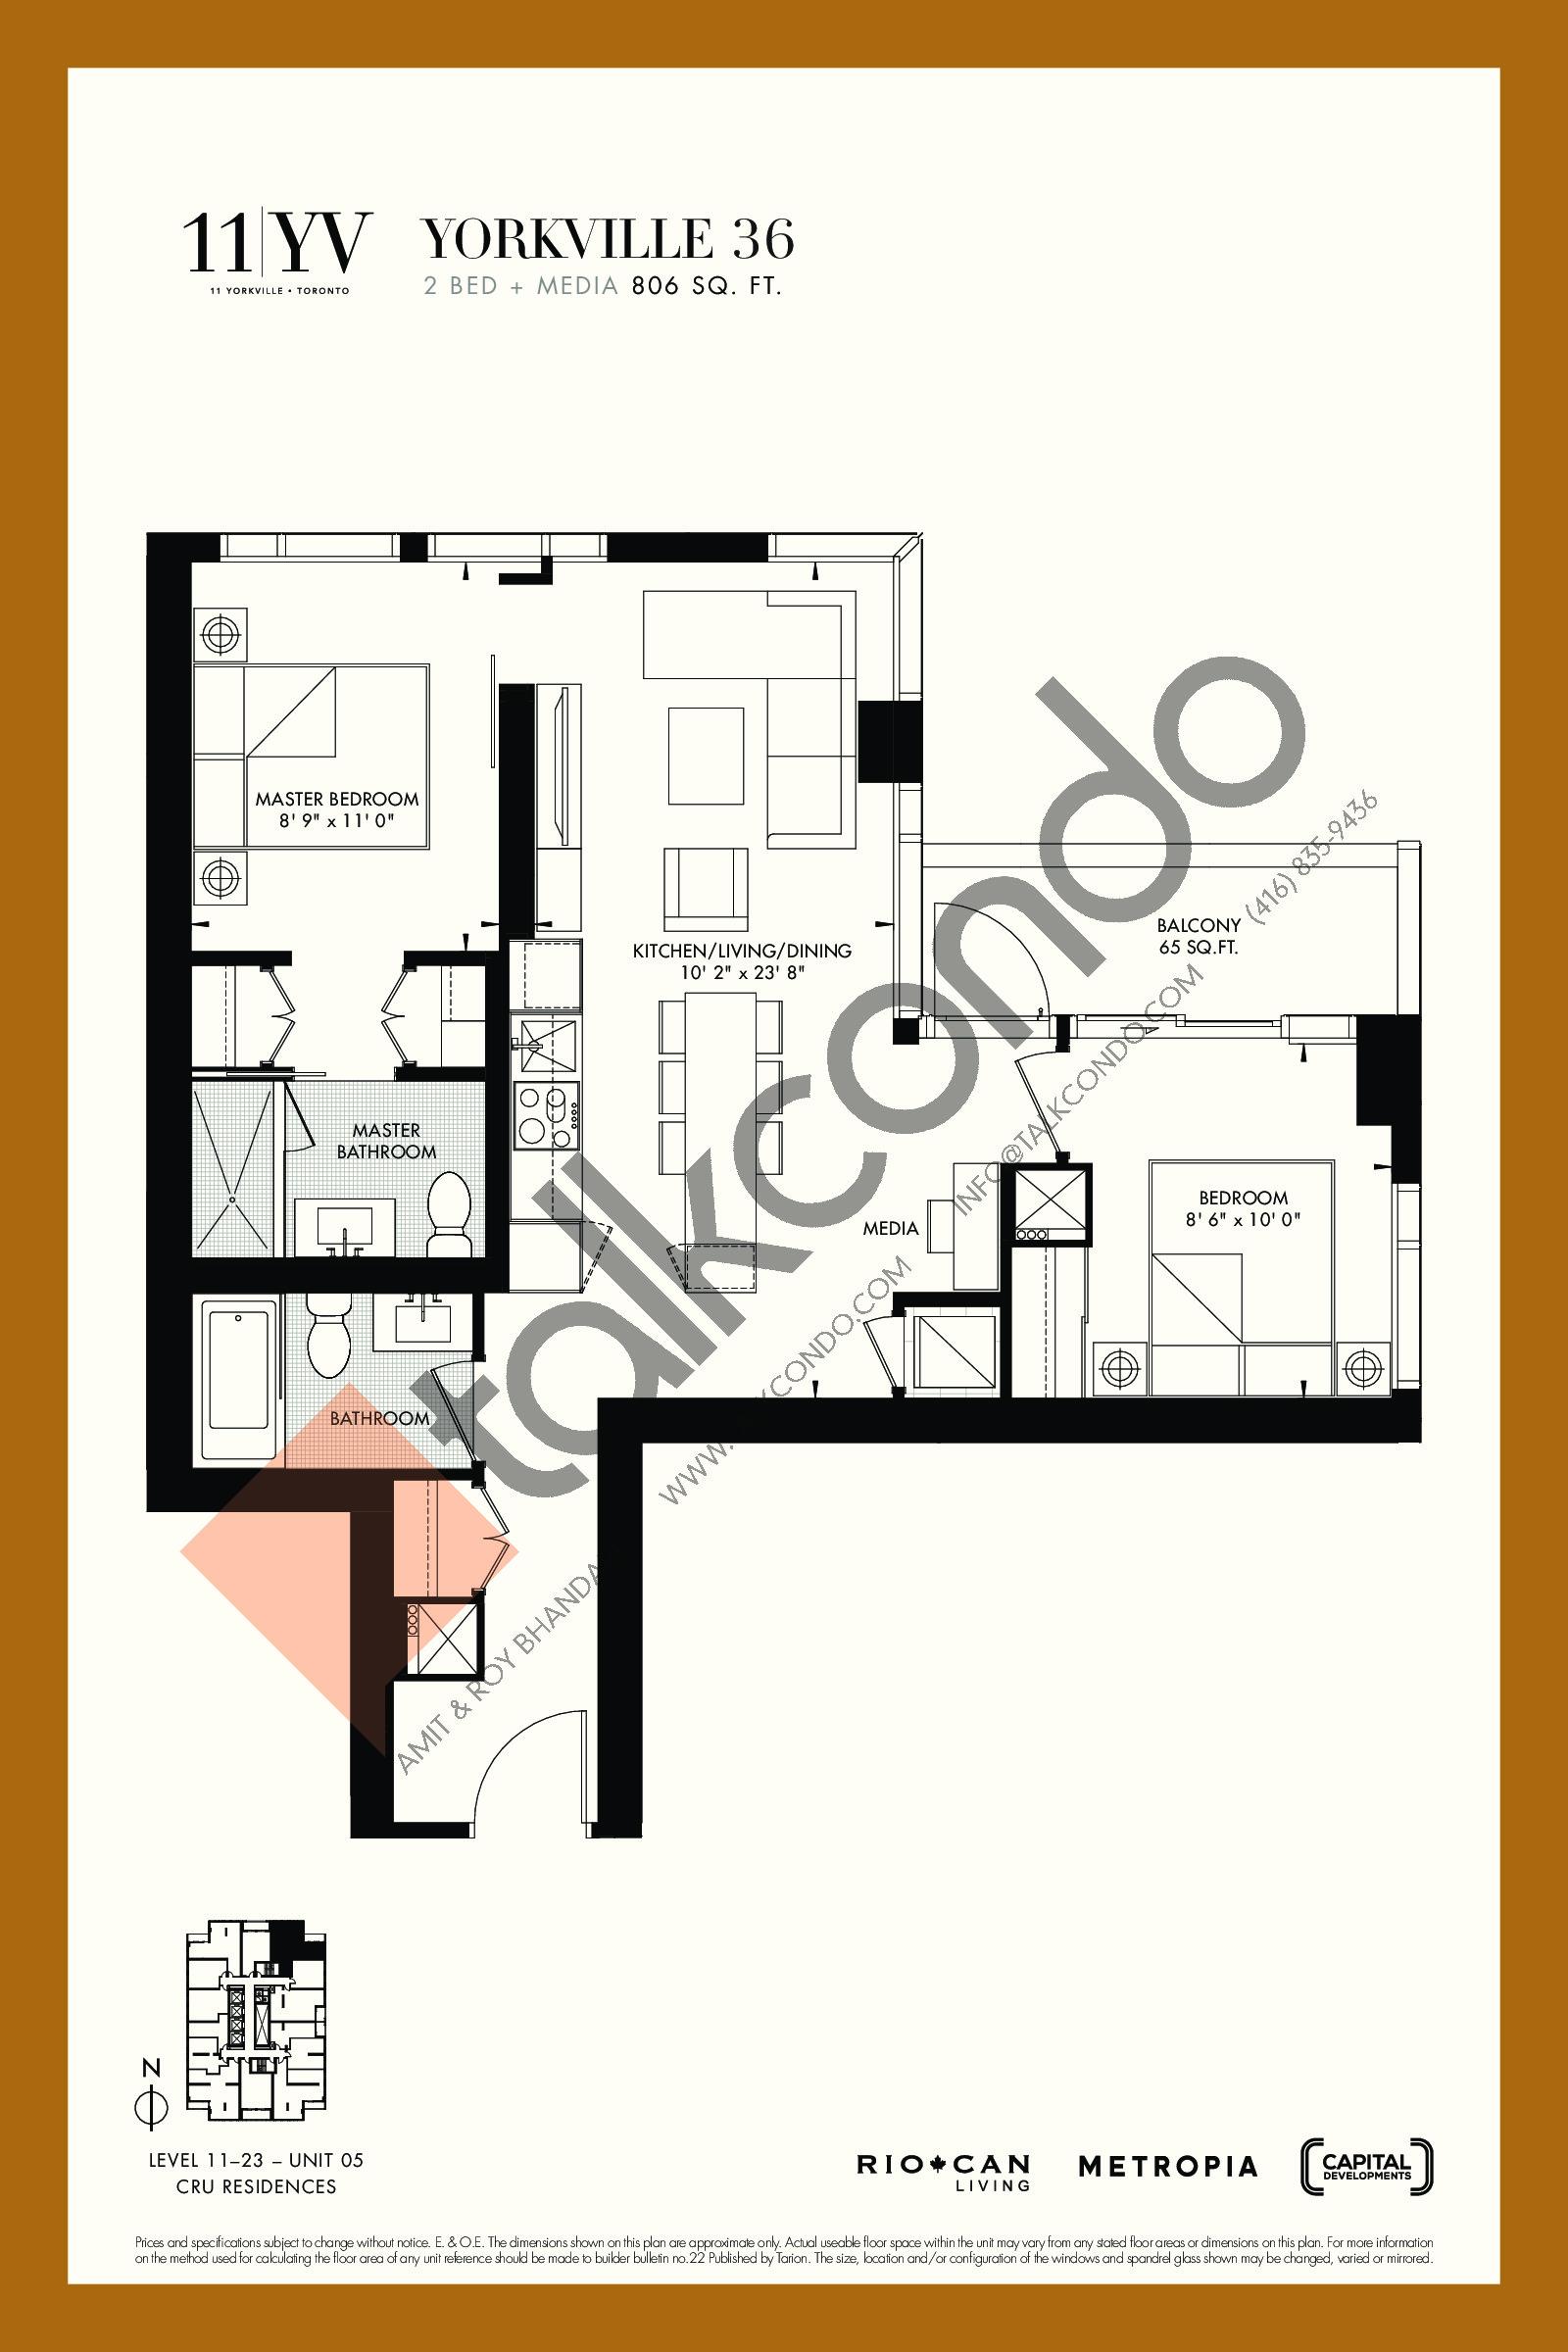 Yorkville 36 Floor Plan at 11YV Condos - 806 sq.ft